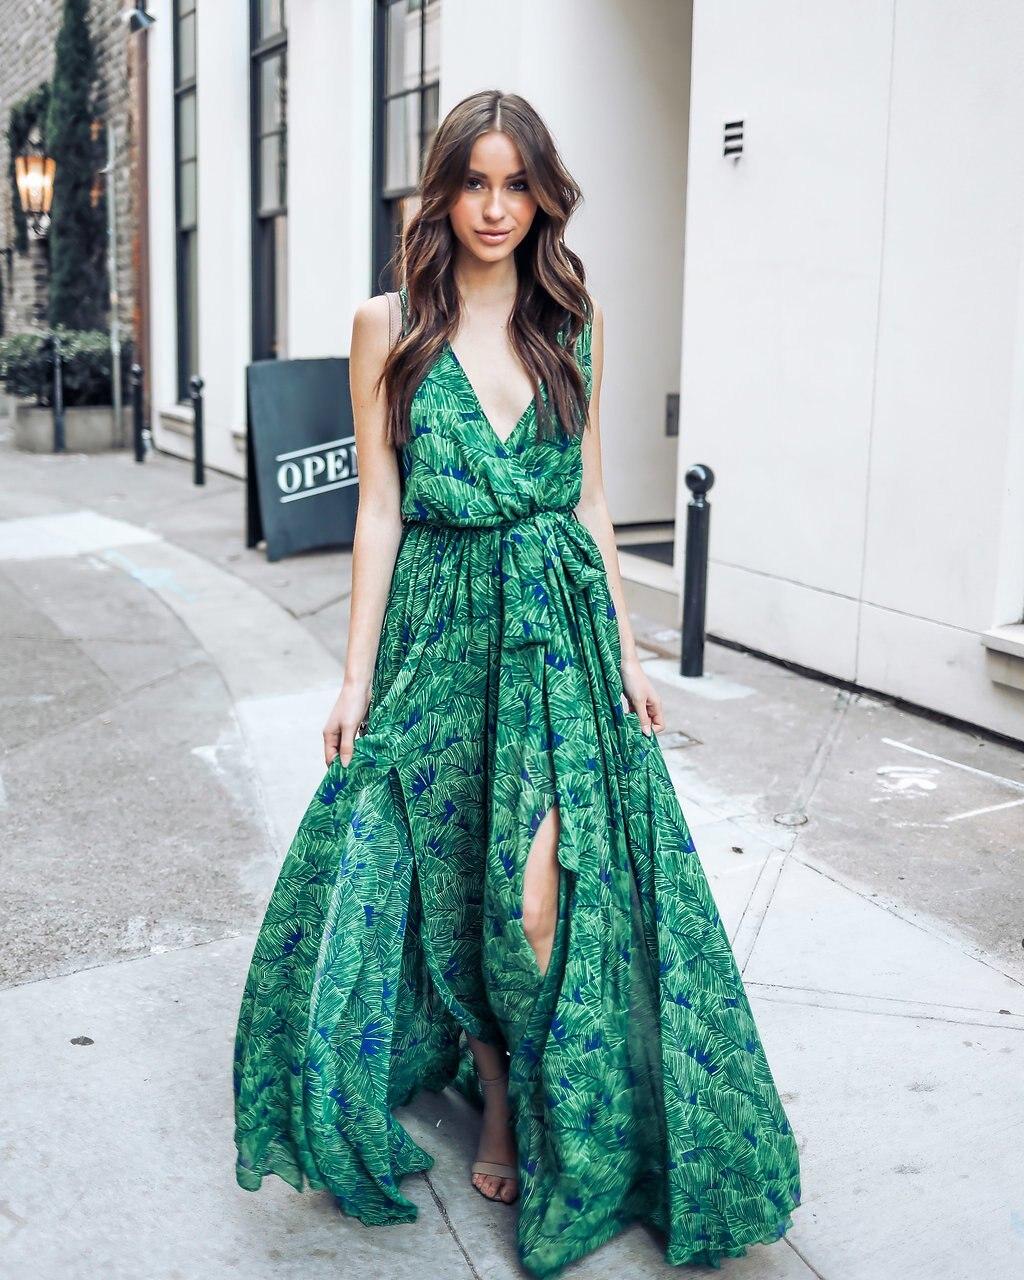 1e68f15341 Floral Print Dress Summer 2018 Sleeveless V Collar Sexy Maxi Dress Holiday  Backless Loose Dress Bohemian